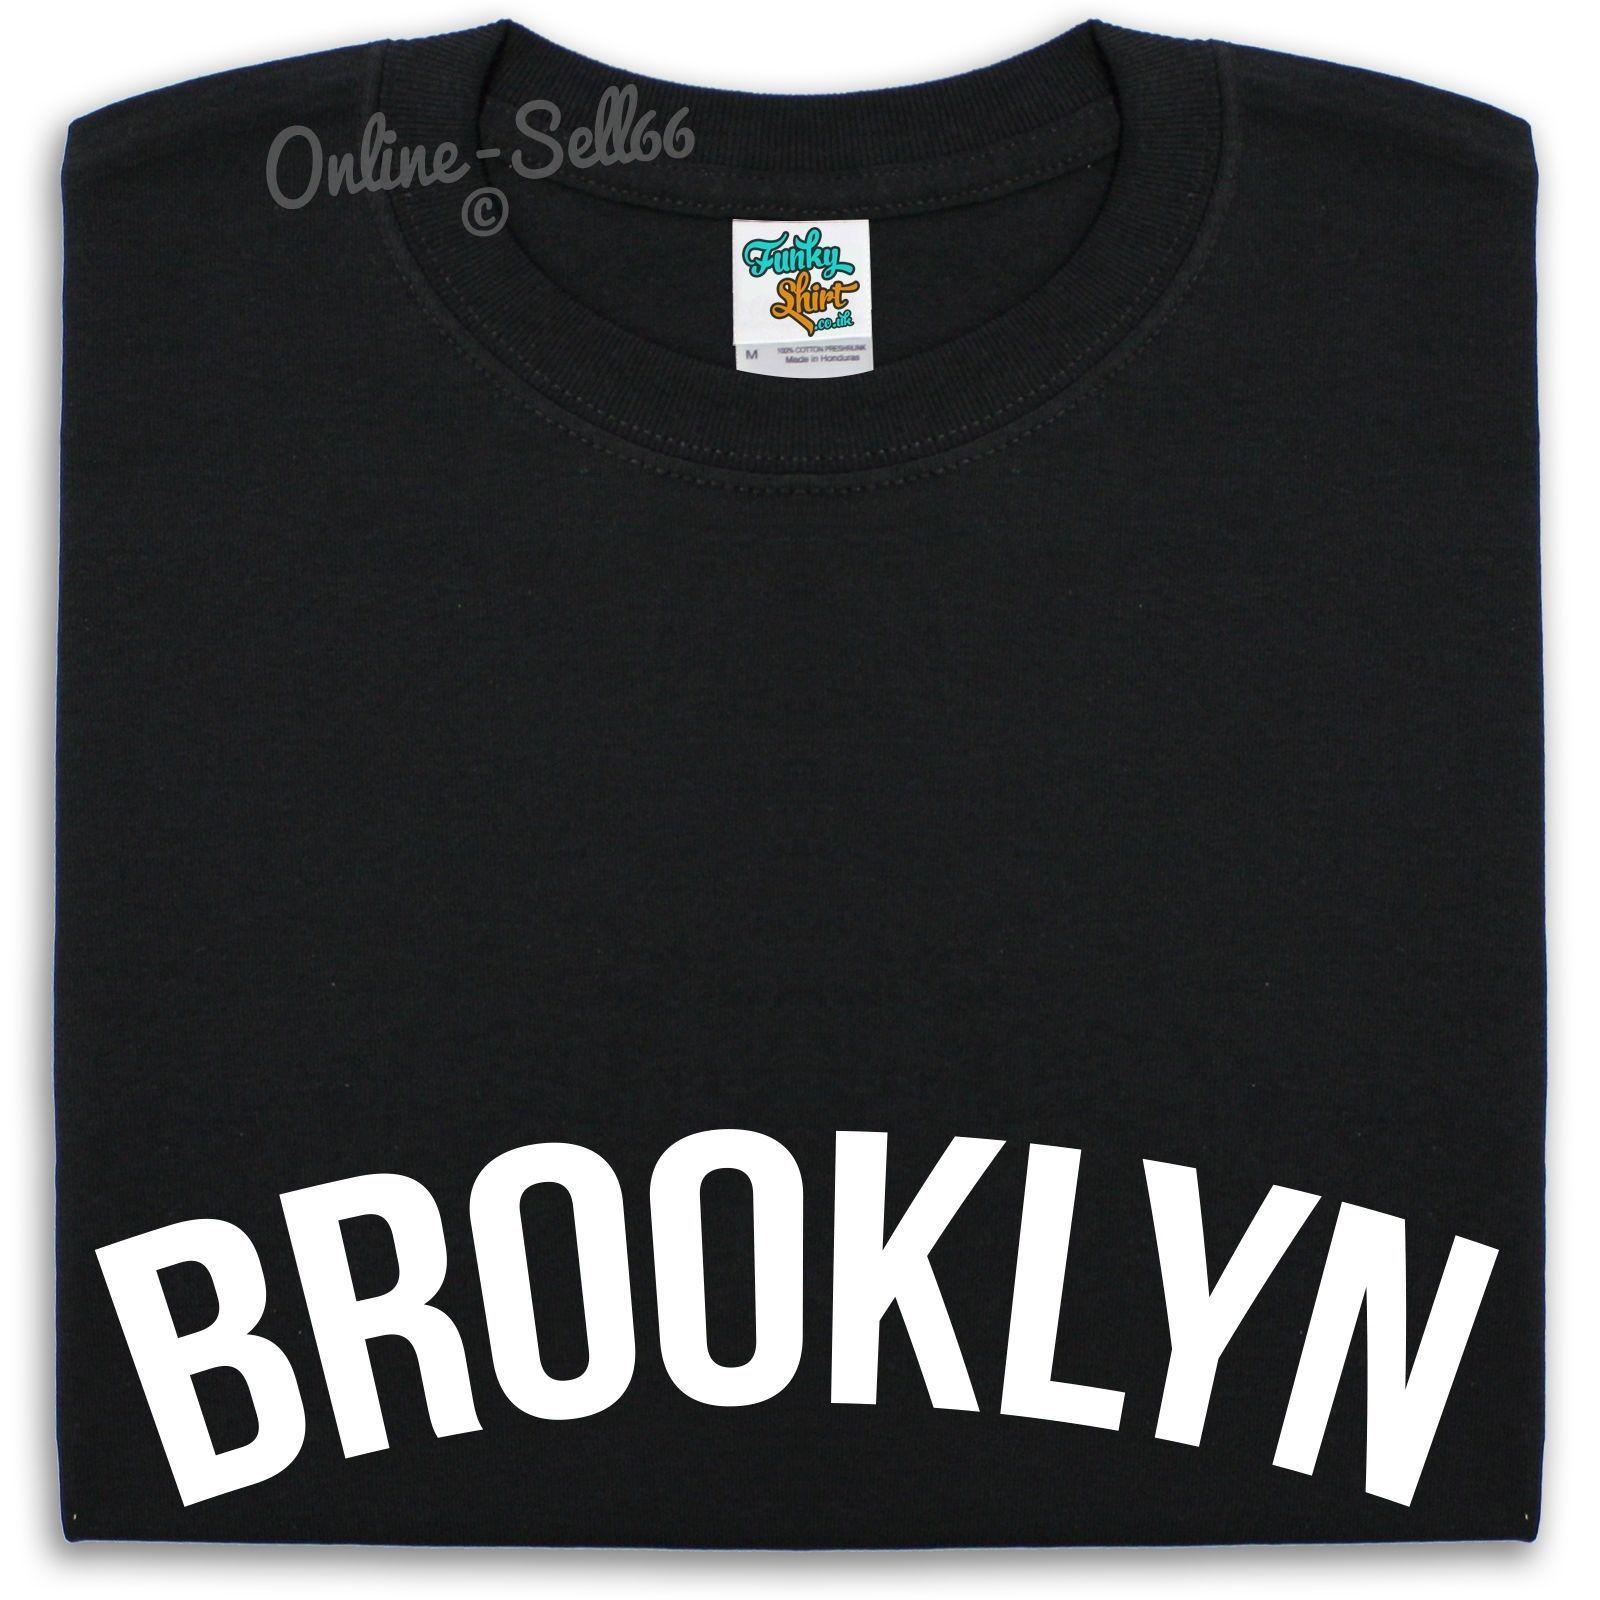 1ac19fefad1fc Acheter Brooklyn T Shirt Hommes Femmes Enfants New York Nyc Cool Casual T  Shirt Hommes Unisexe Nouveau Mode Tshirt De  10.66 Du Cls6688522